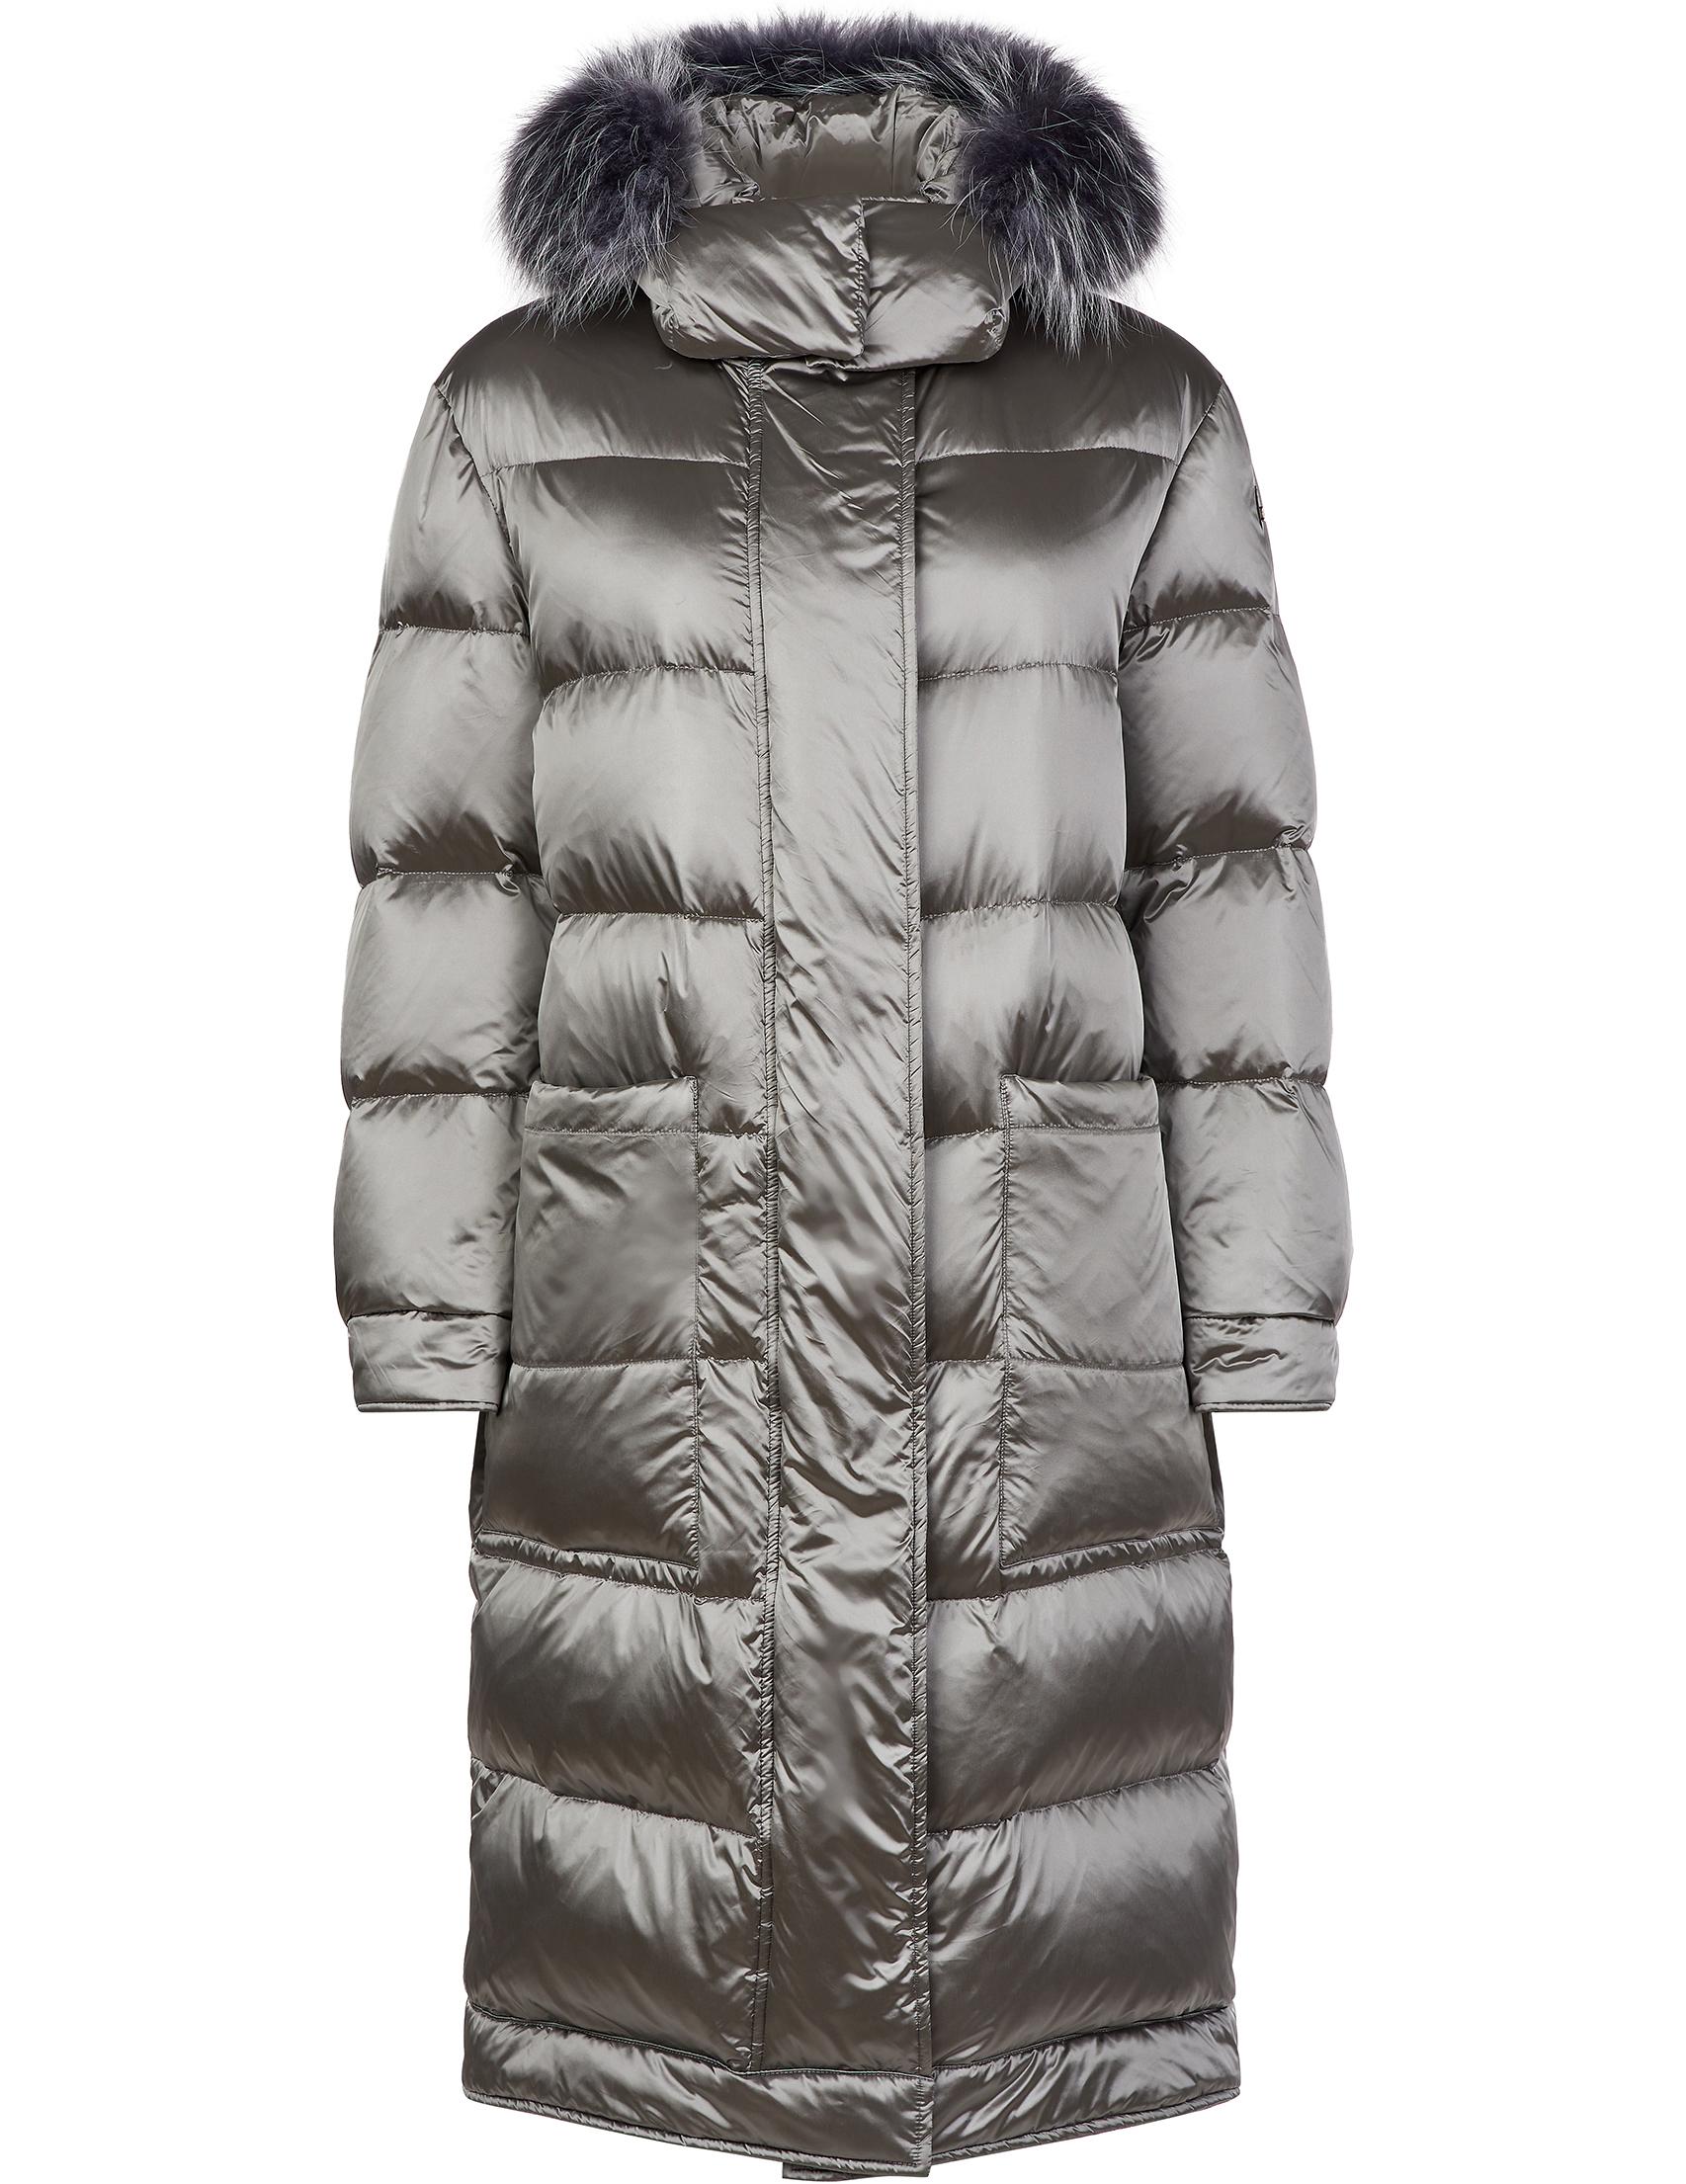 Купить Куртки, Куртка, GALLOTTI, Серый, 100%Полиамид;100%Полиэстер, Осень-Зима